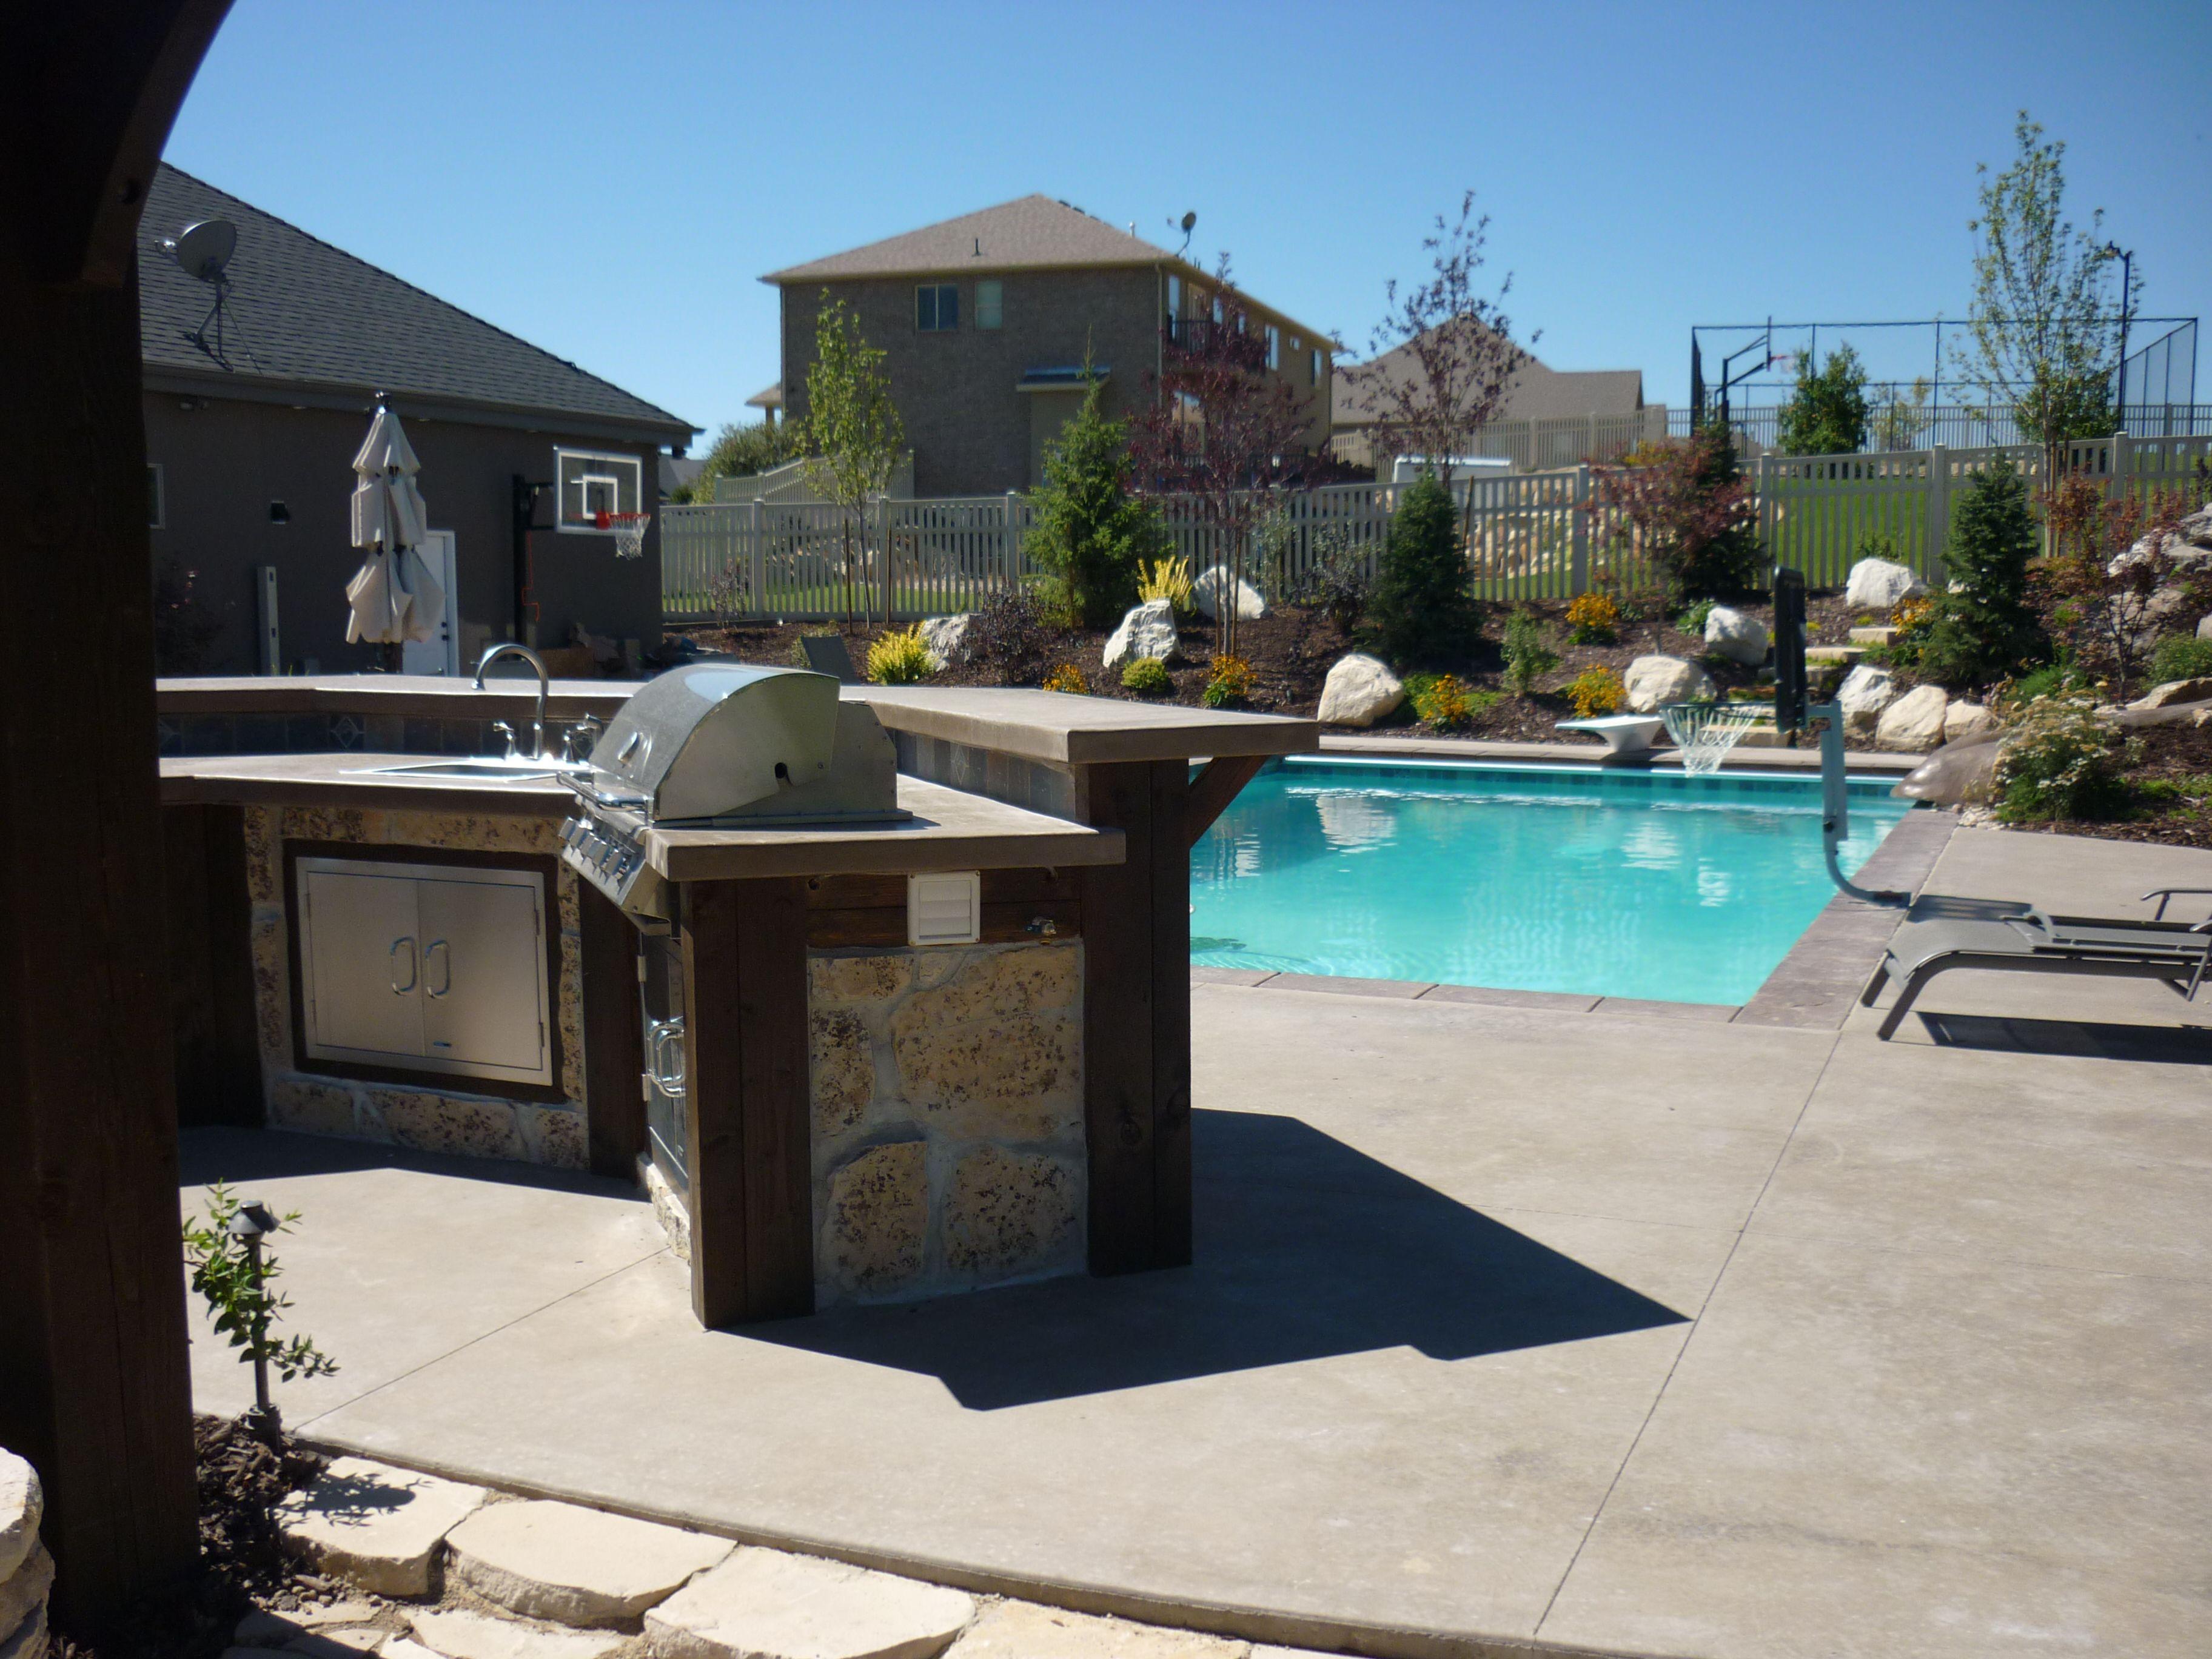 The Creative Fun Backyard For Everyone To Enjoy Outdoor Kitchens Patios Pergolas